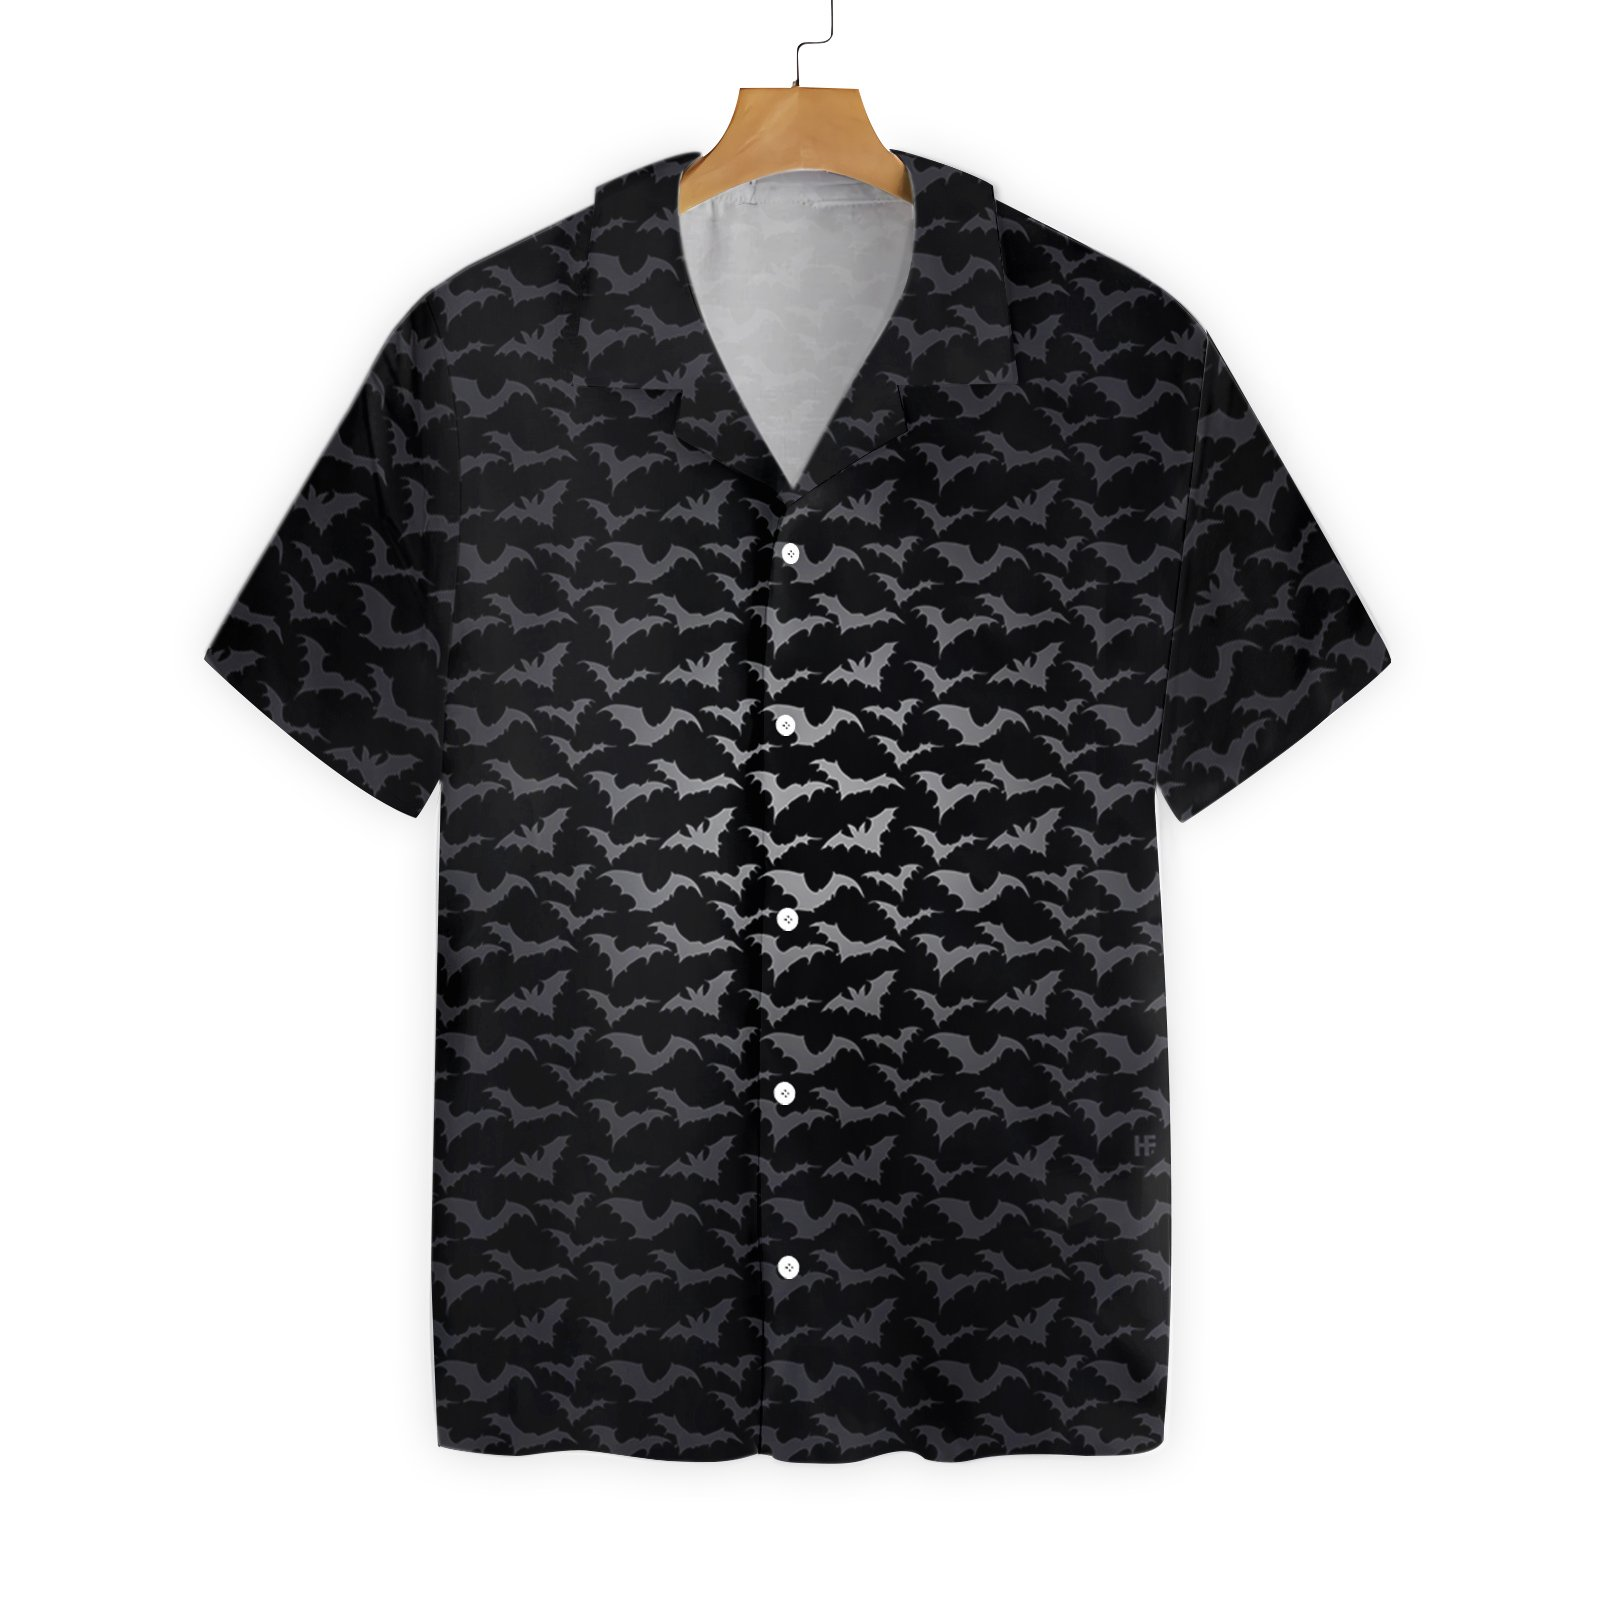 Seamless Bat Goth Hawaiian Shirt